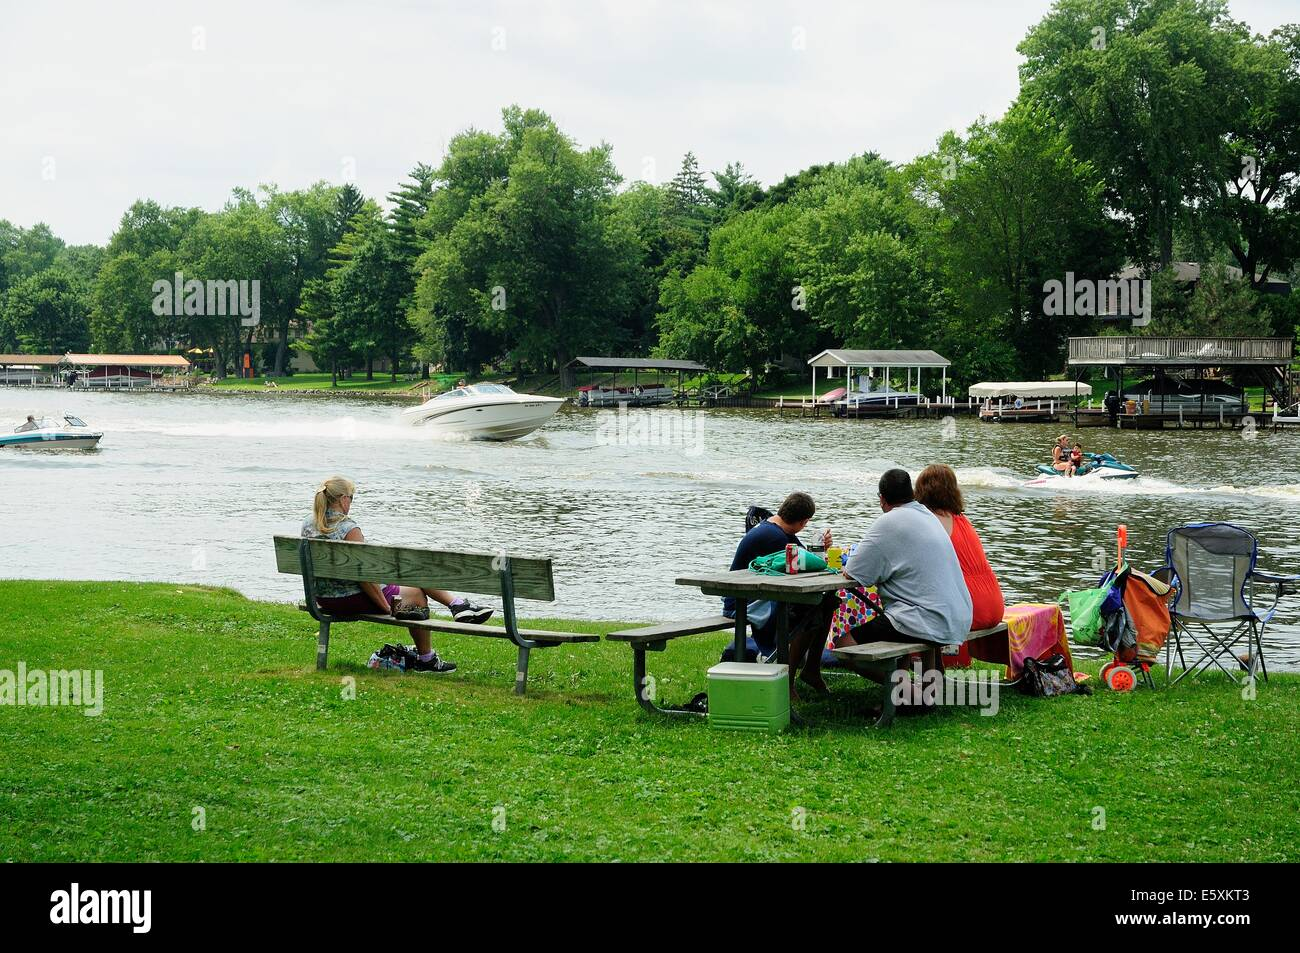 People picnicking along river bank. - Stock Image